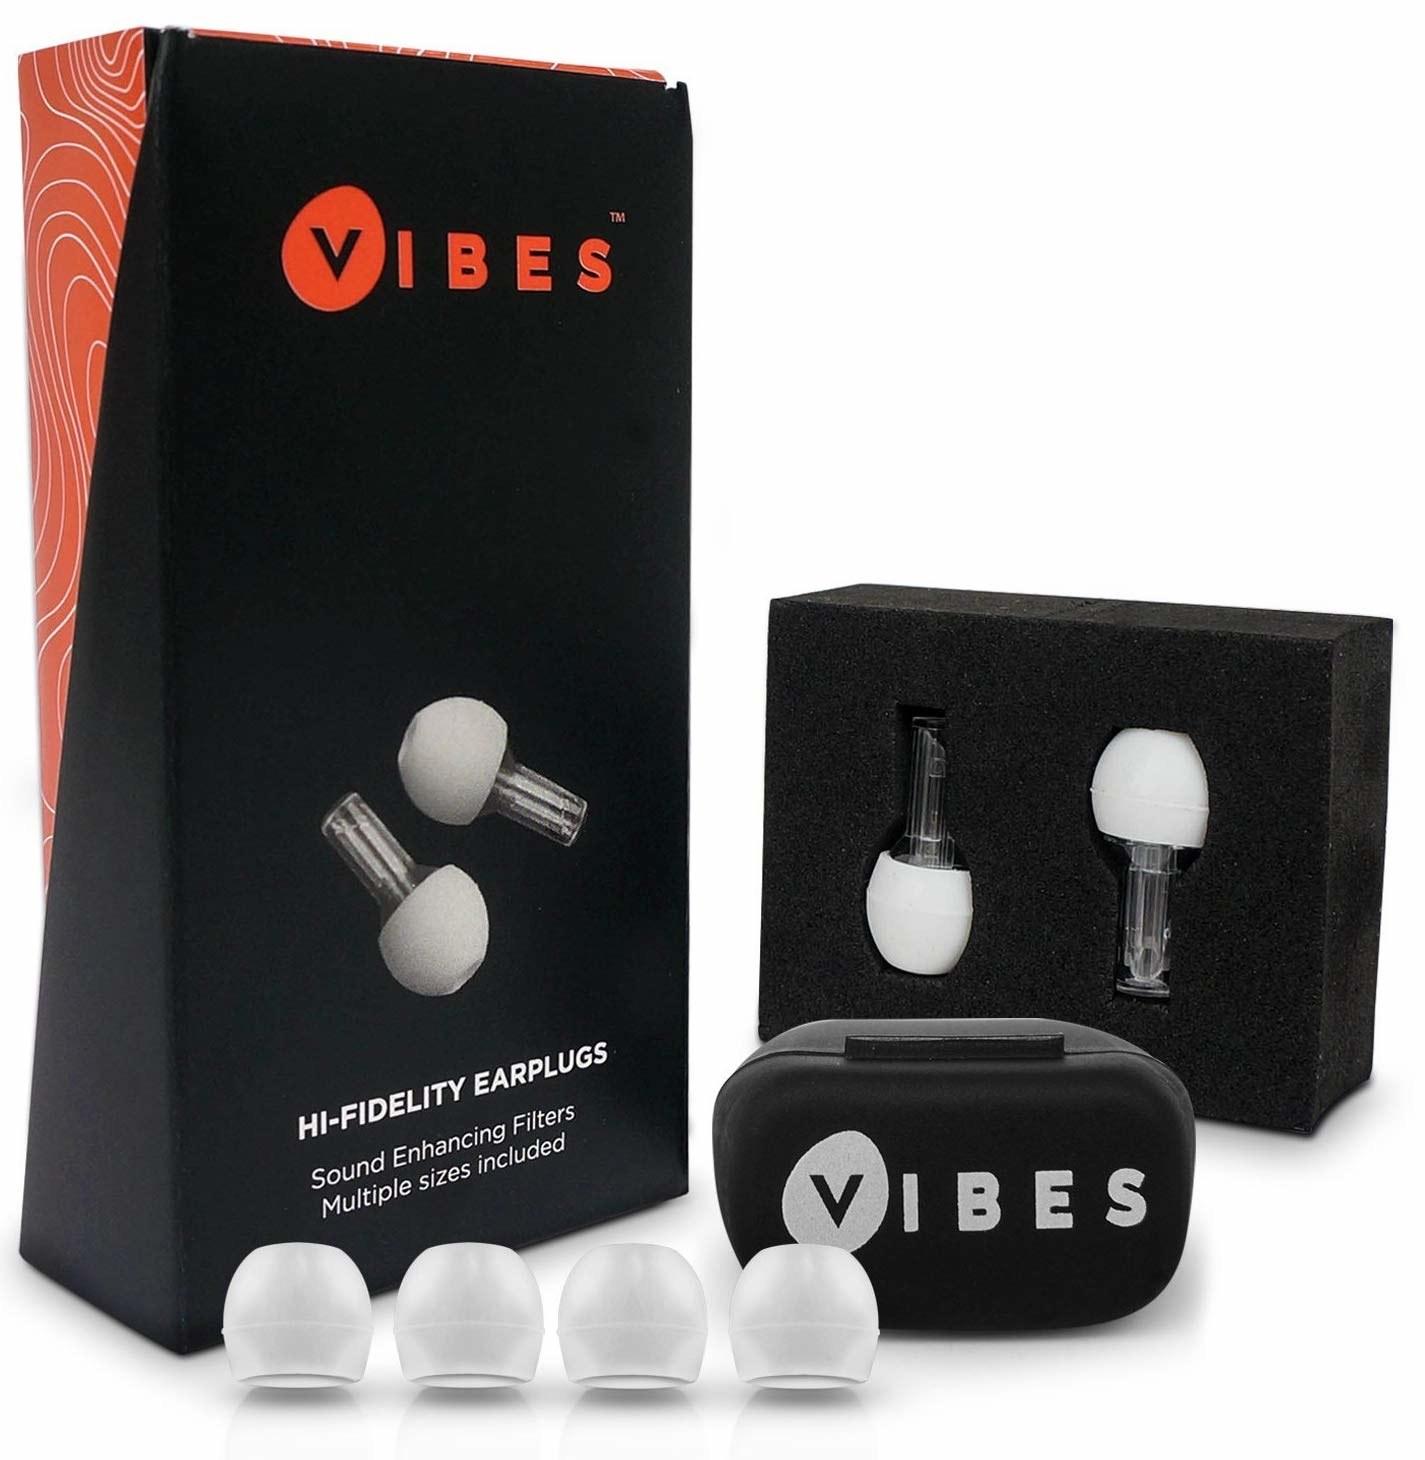 The Vibes High Fidelity earplugs